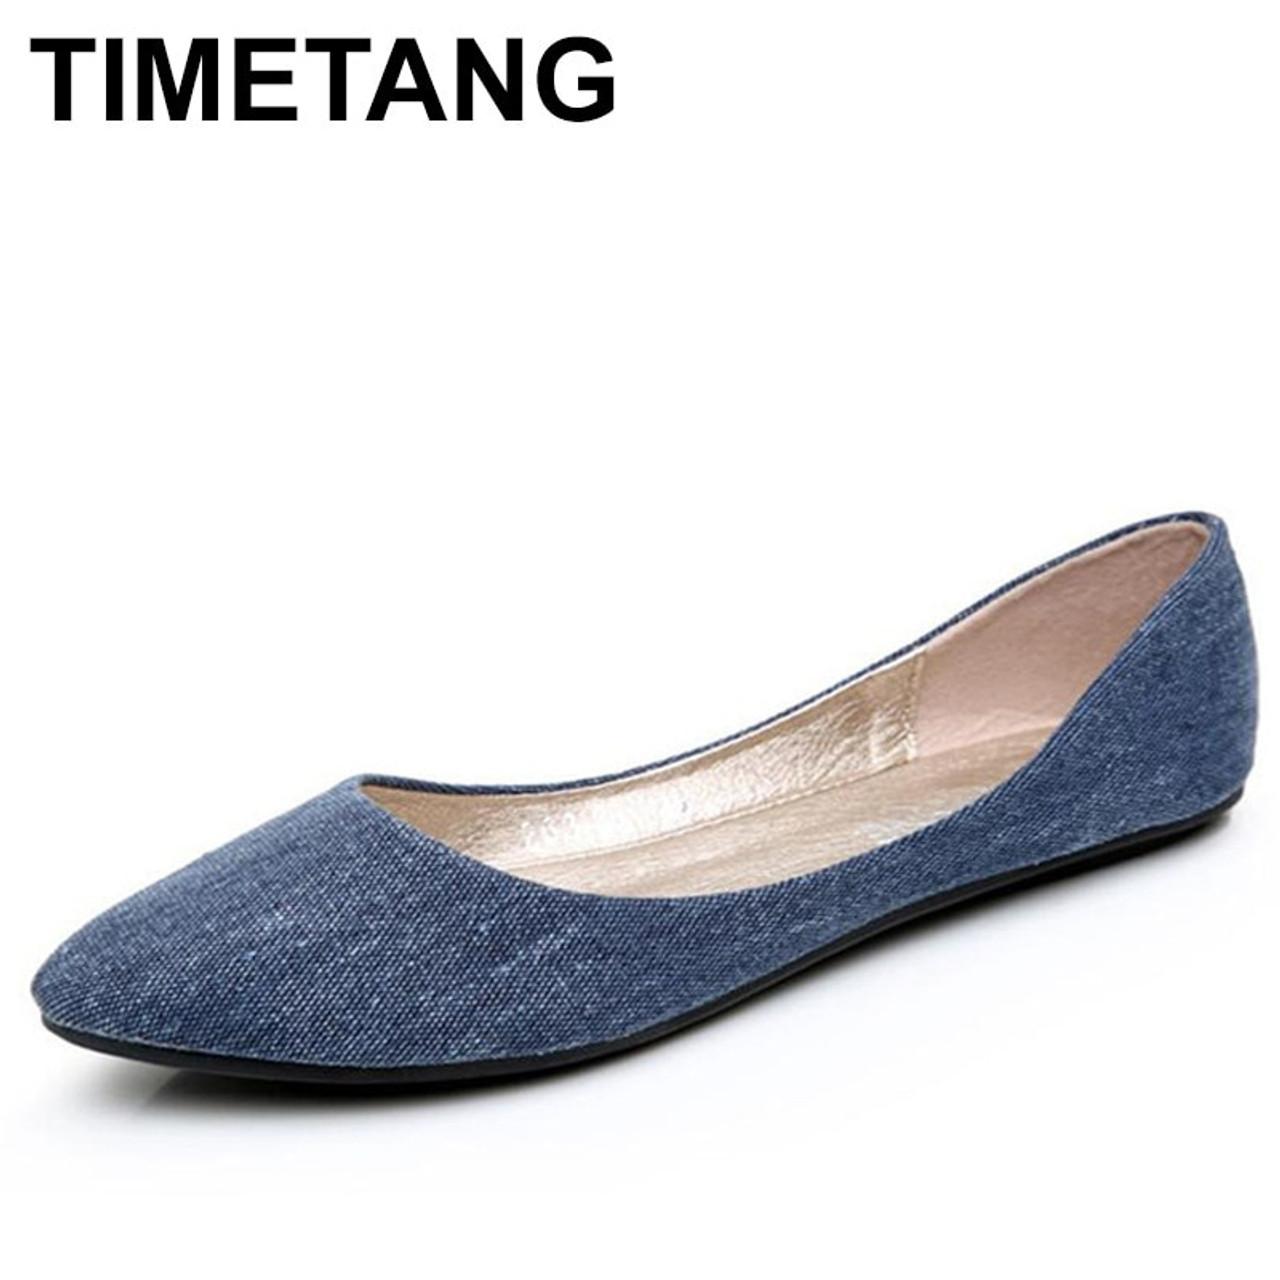 TIMETANG New Women Soft Denim Flats Blue Fashion High Quality Basic Pointy  Toe Ballerina Ballet Flat ... 0e40d8047ffa